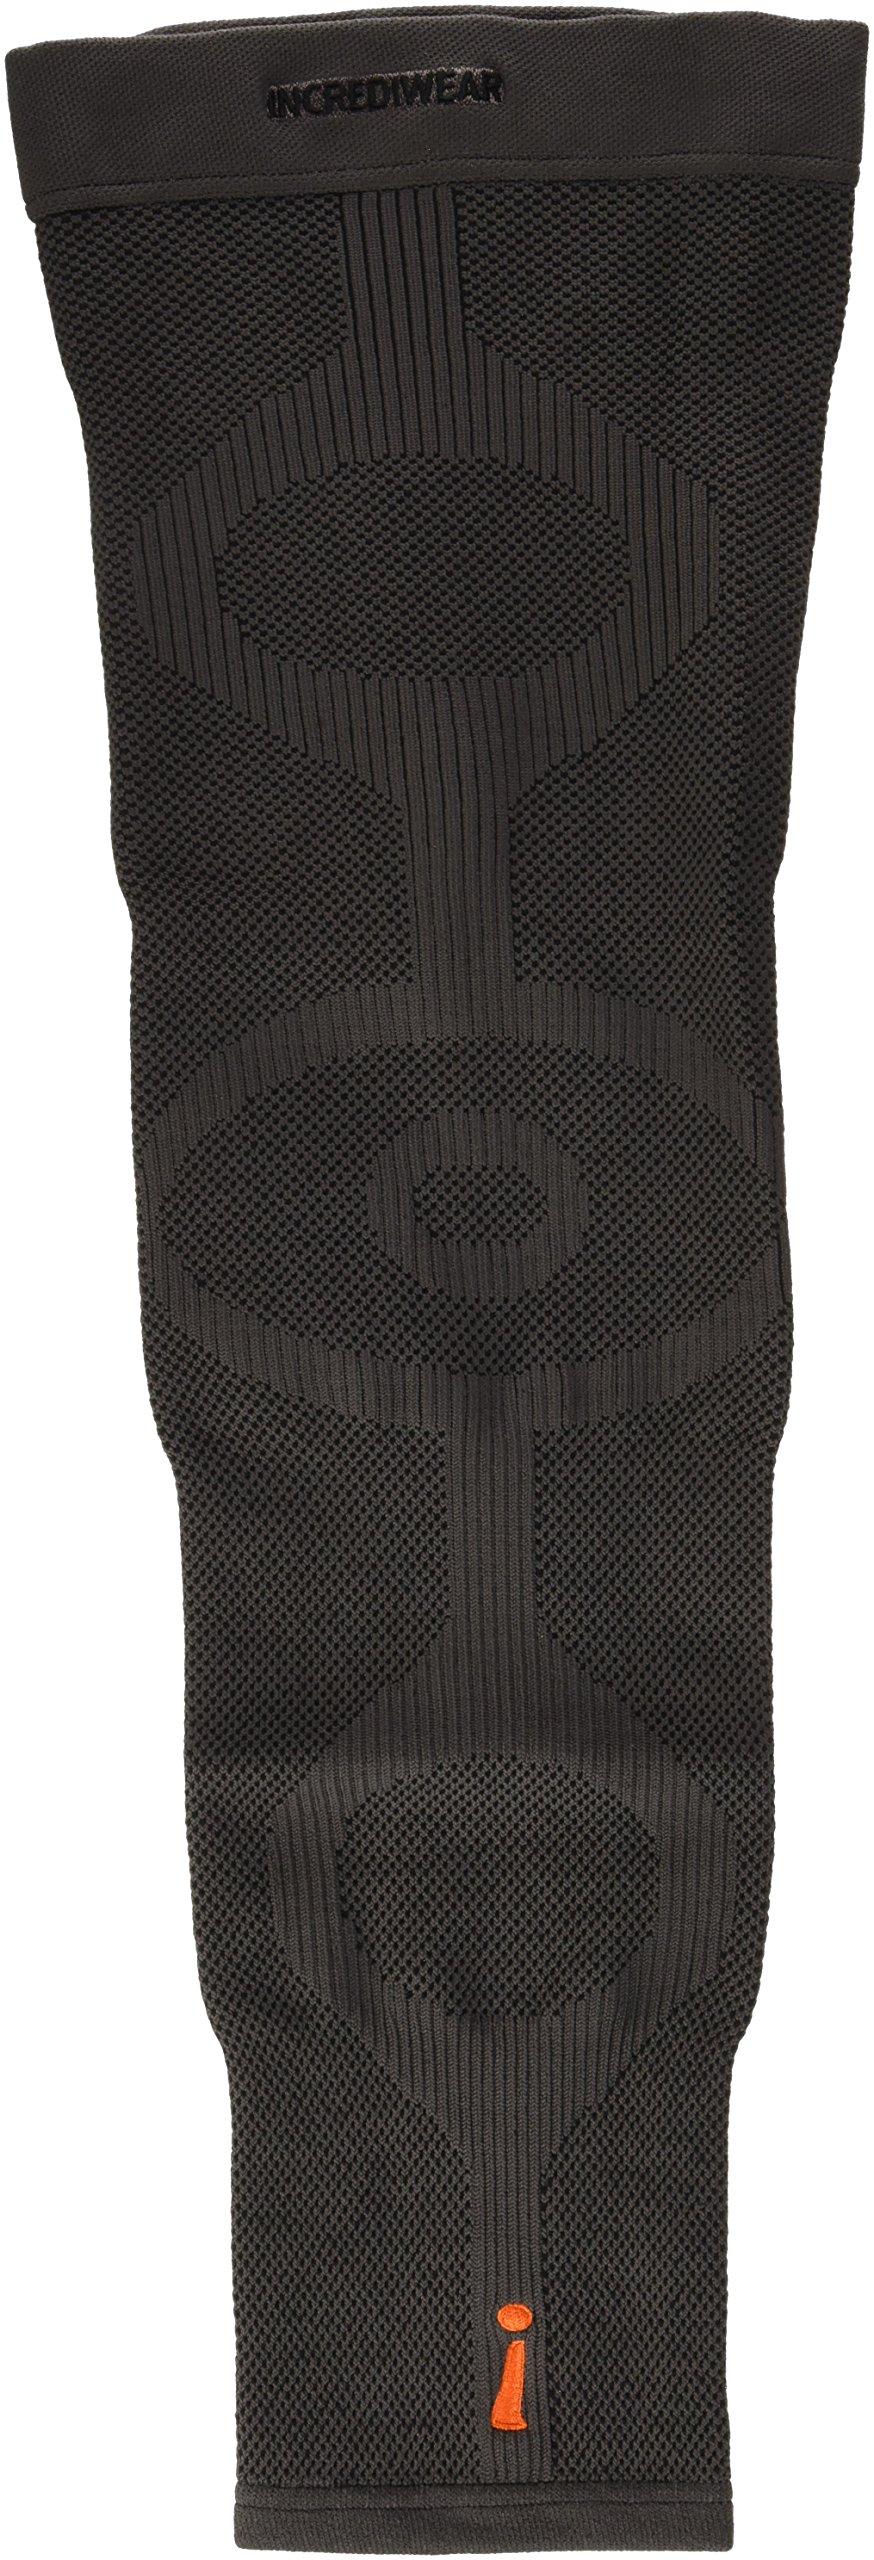 INCREDIWEAR Single Leg Sleeve, Charcoal, Large, 0.03 Pound